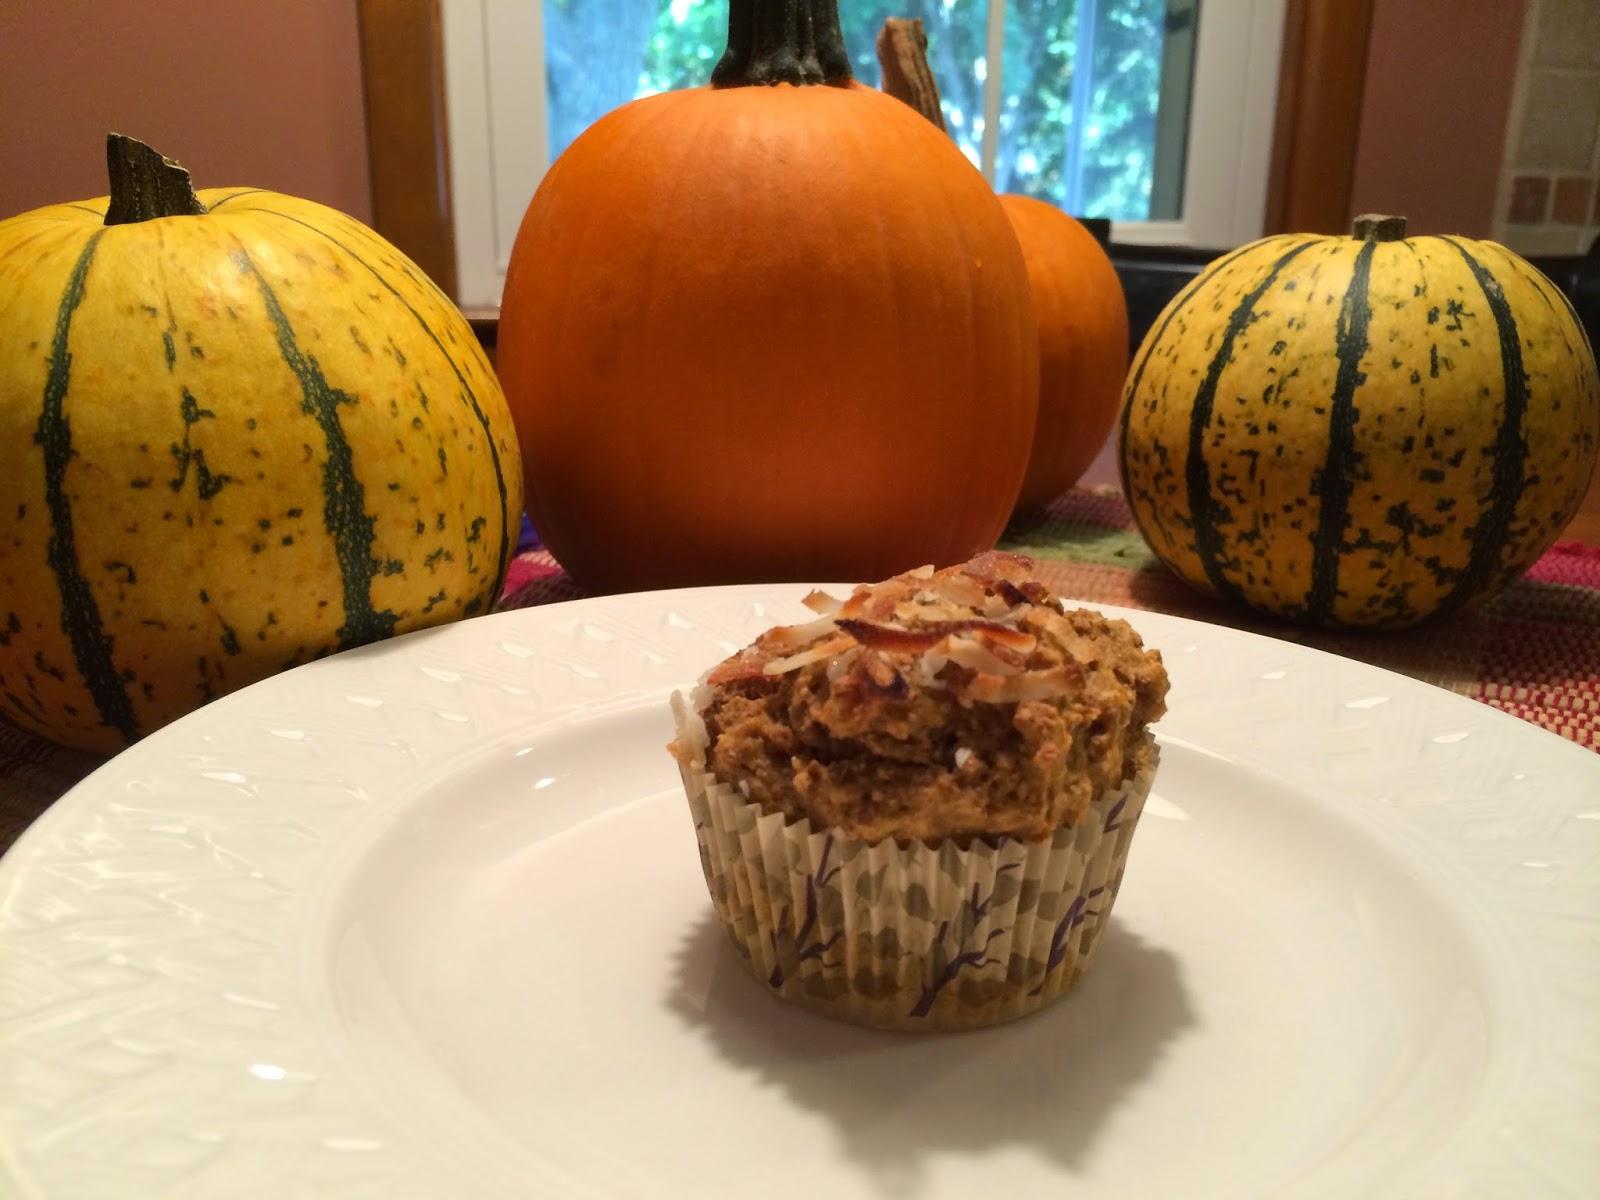 Pumpkin Bran Muffin Recpie